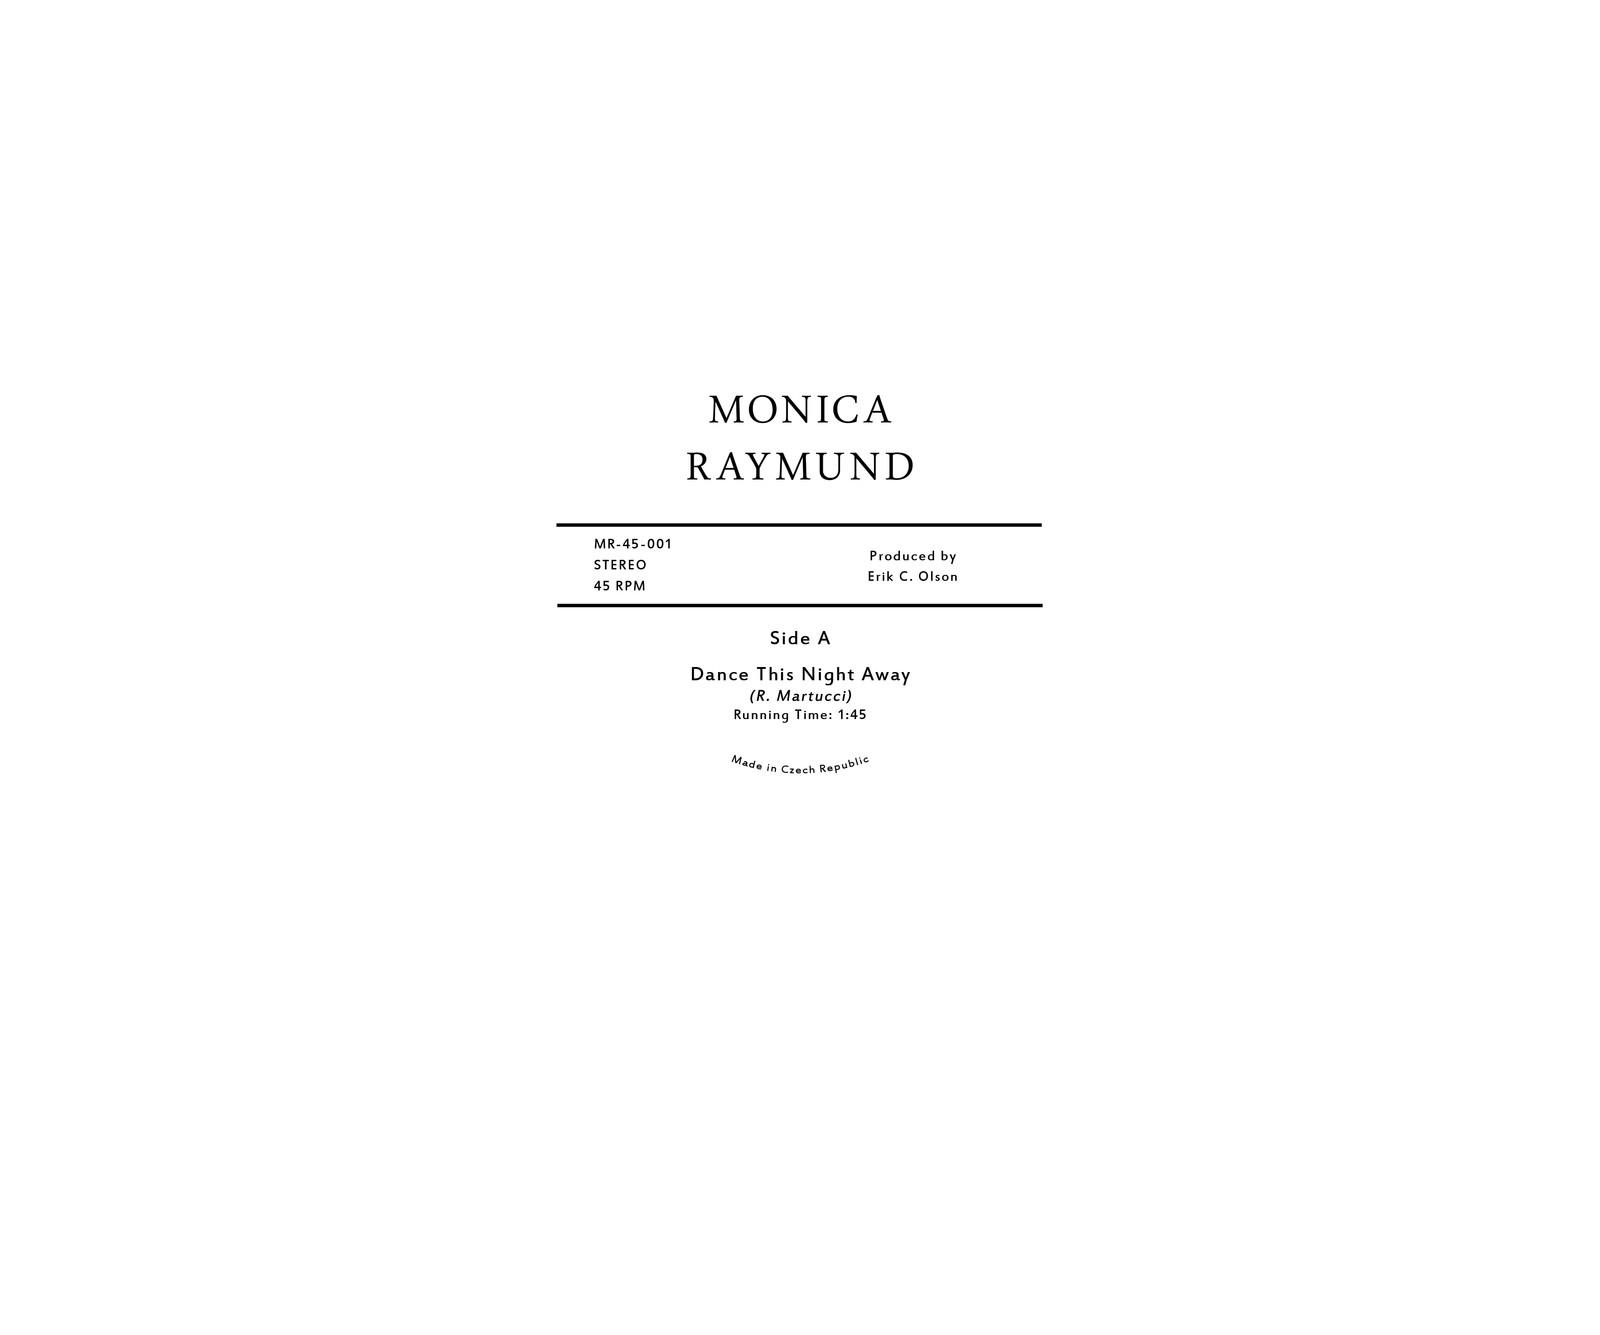 Monica Raymund, Center Label Design for Record